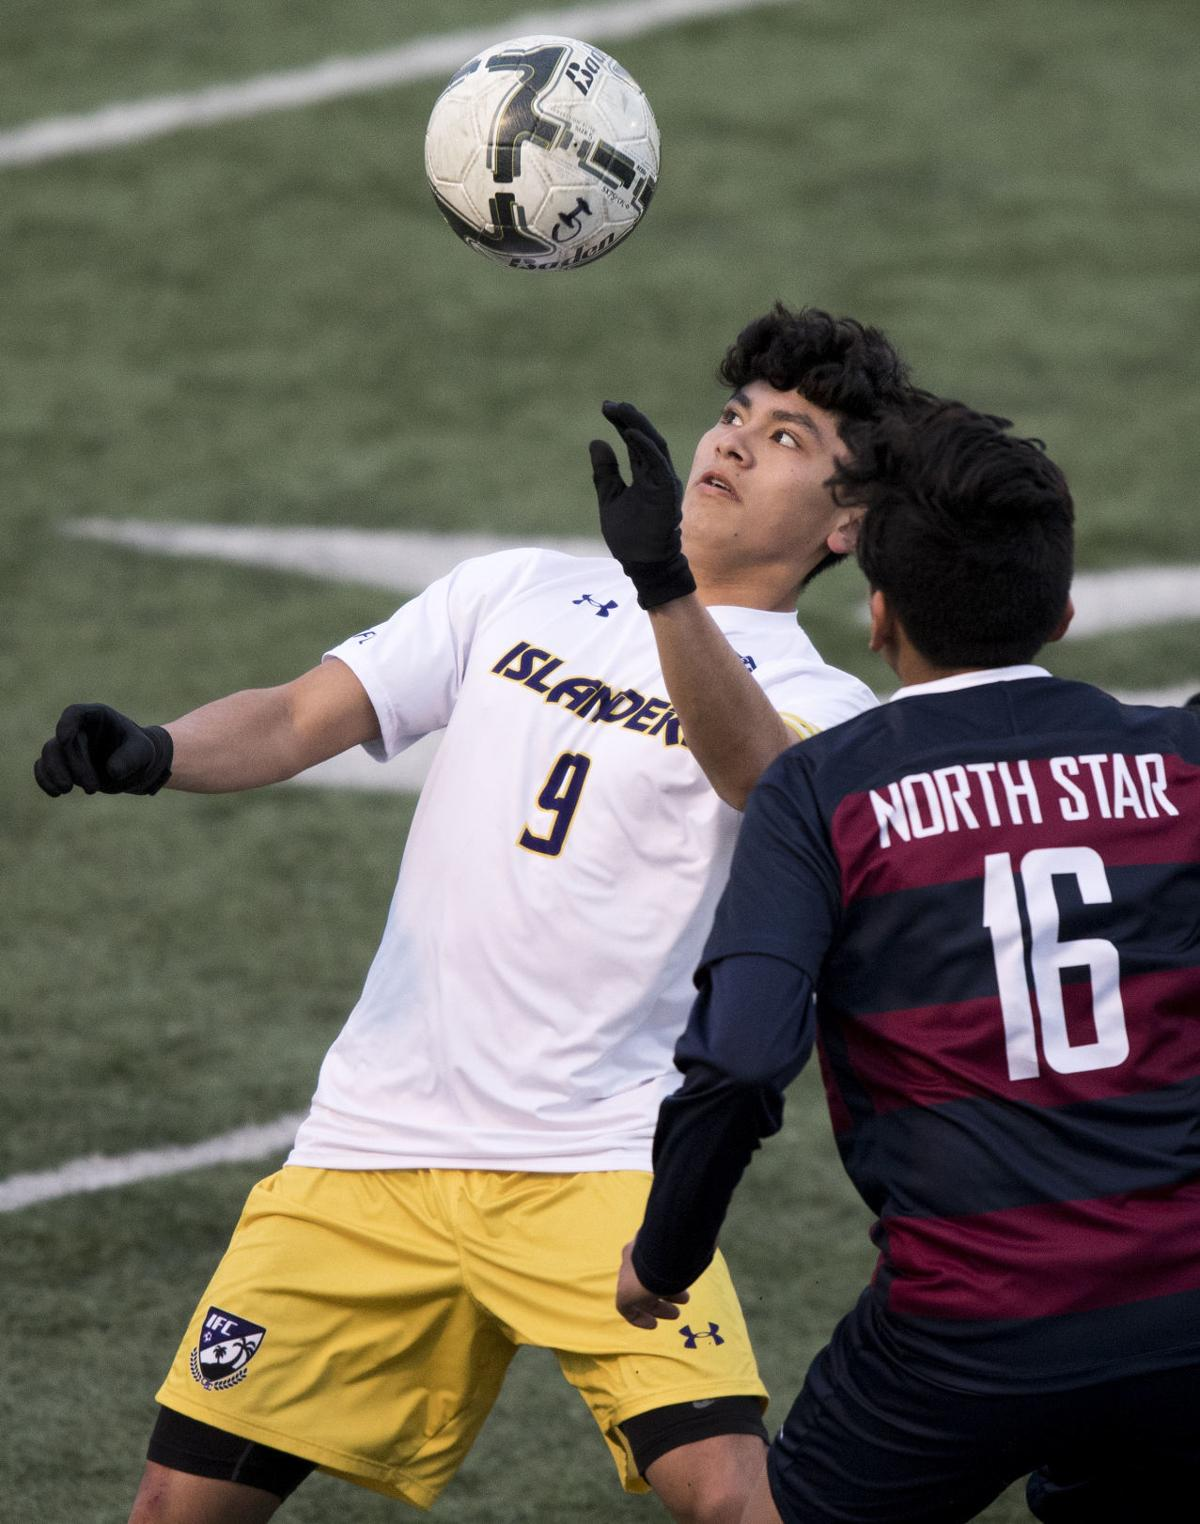 Lincoln North Star vs. Grand Island, HAC boys soccer, 4/4